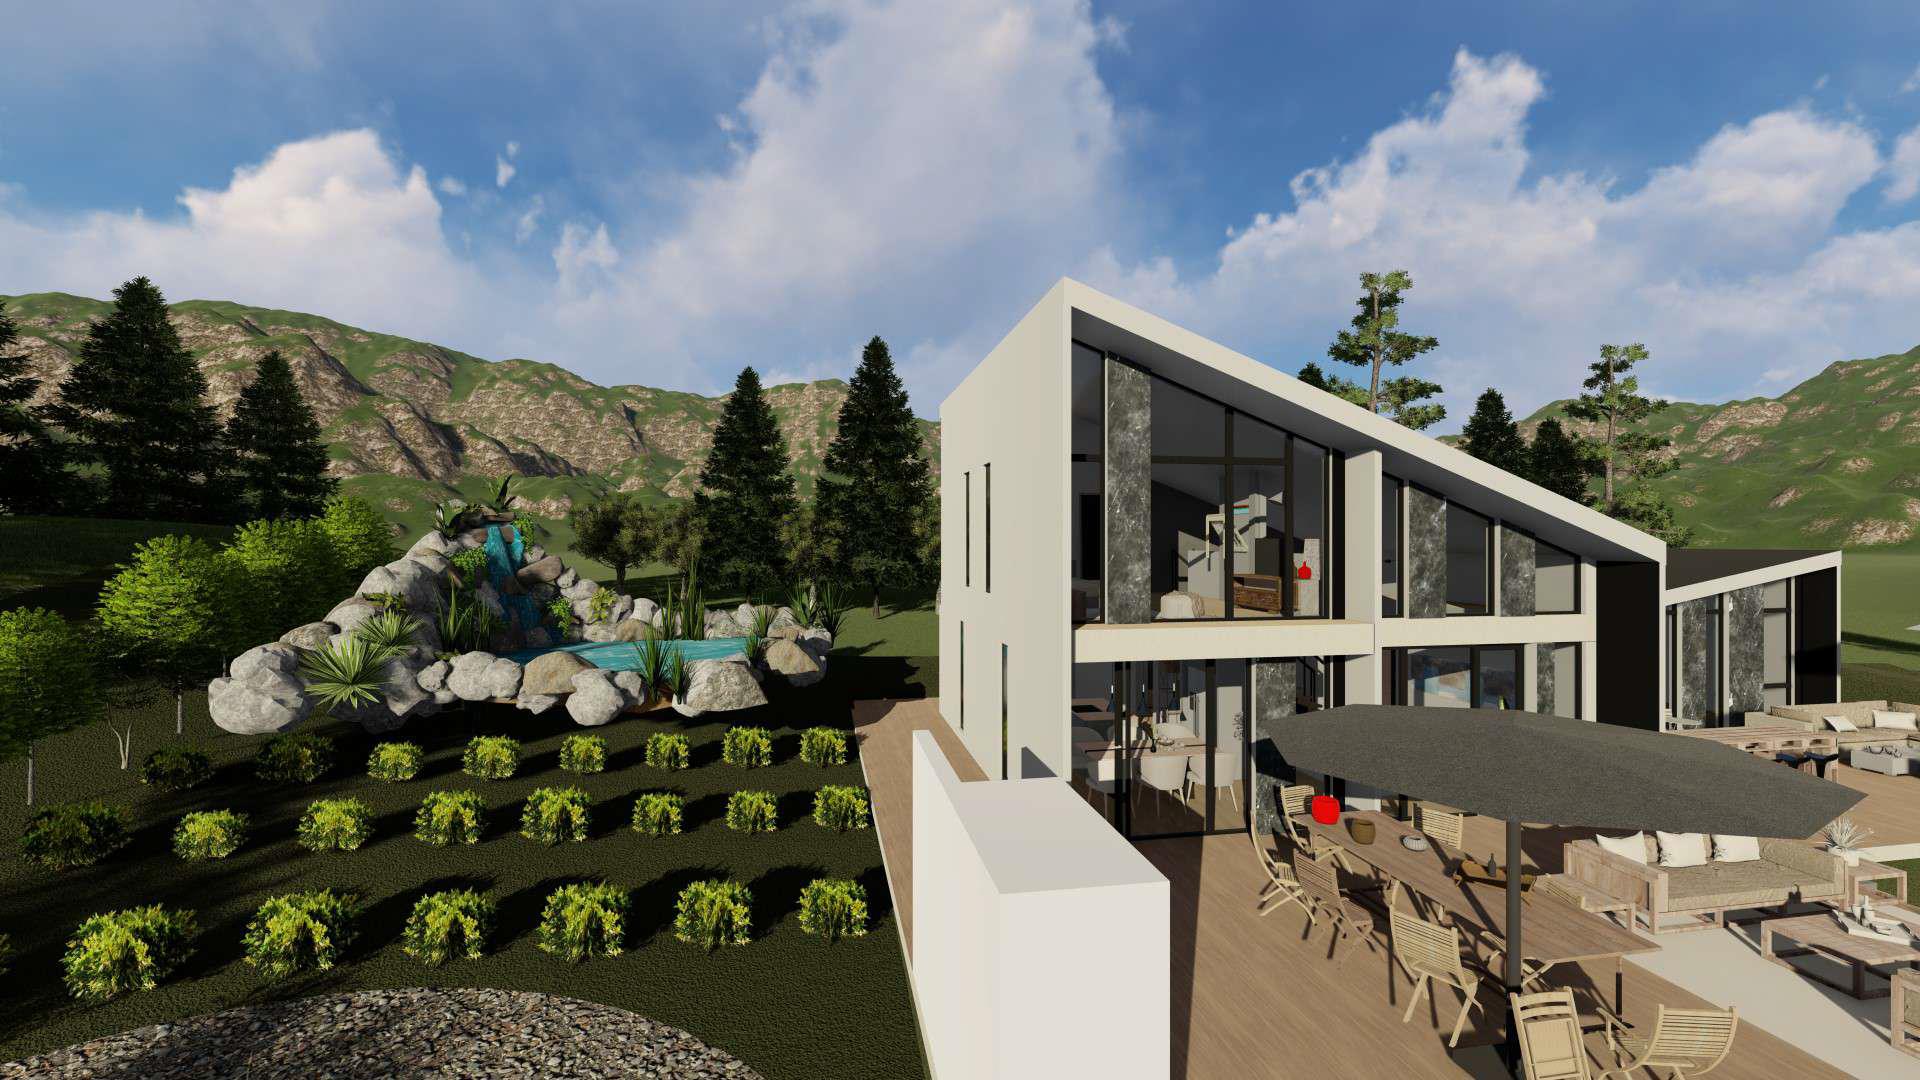 Tevalcor Model - Sustainable Home - Ecuador